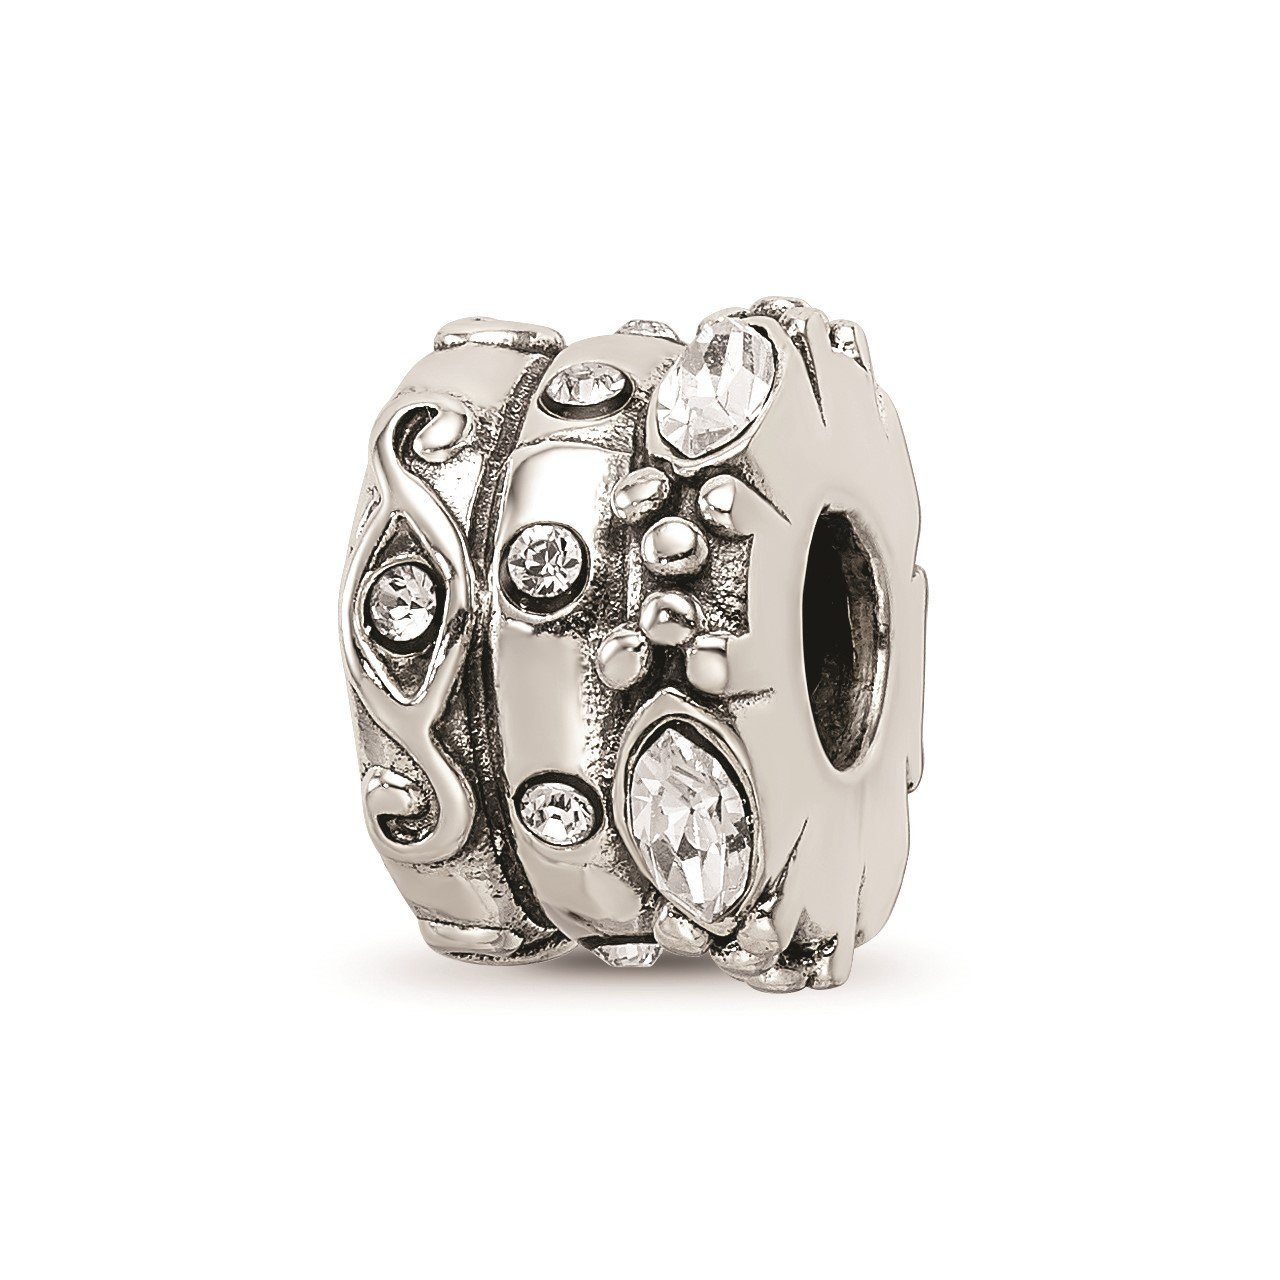 Sterling Silver Reflections Swarovski Crystal Fancy Bali Bead